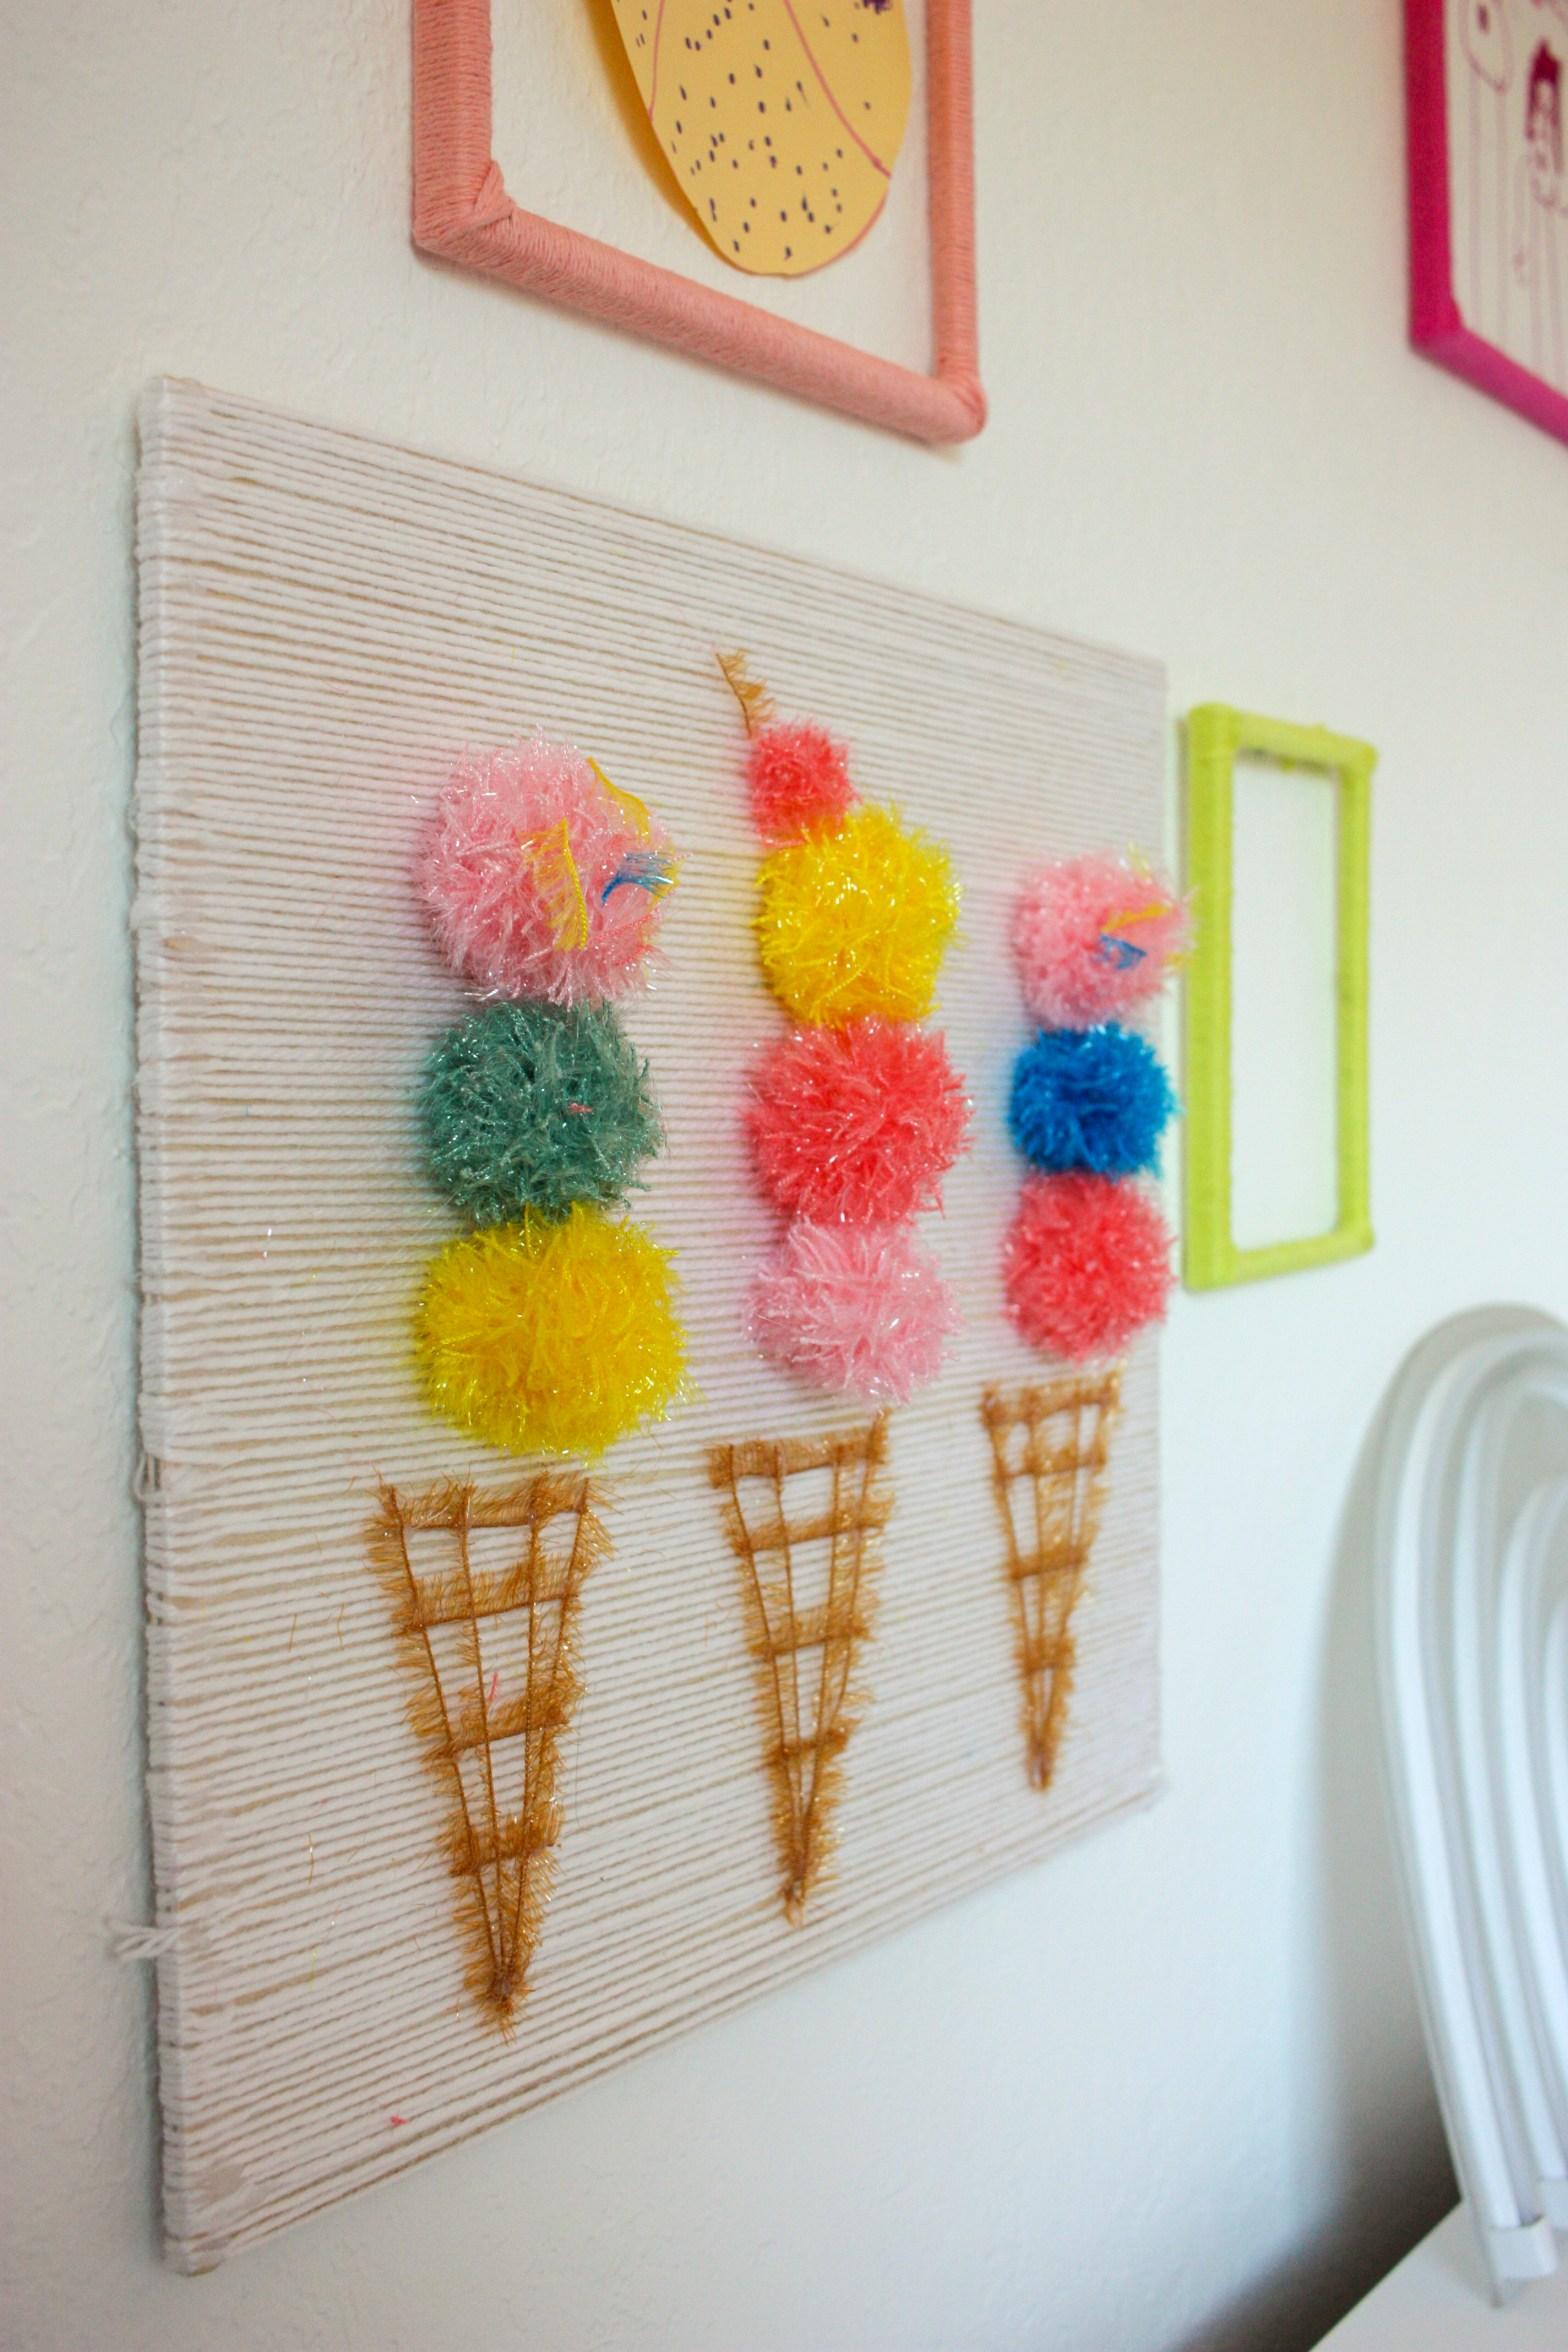 DIY Ice Cream Wall Art